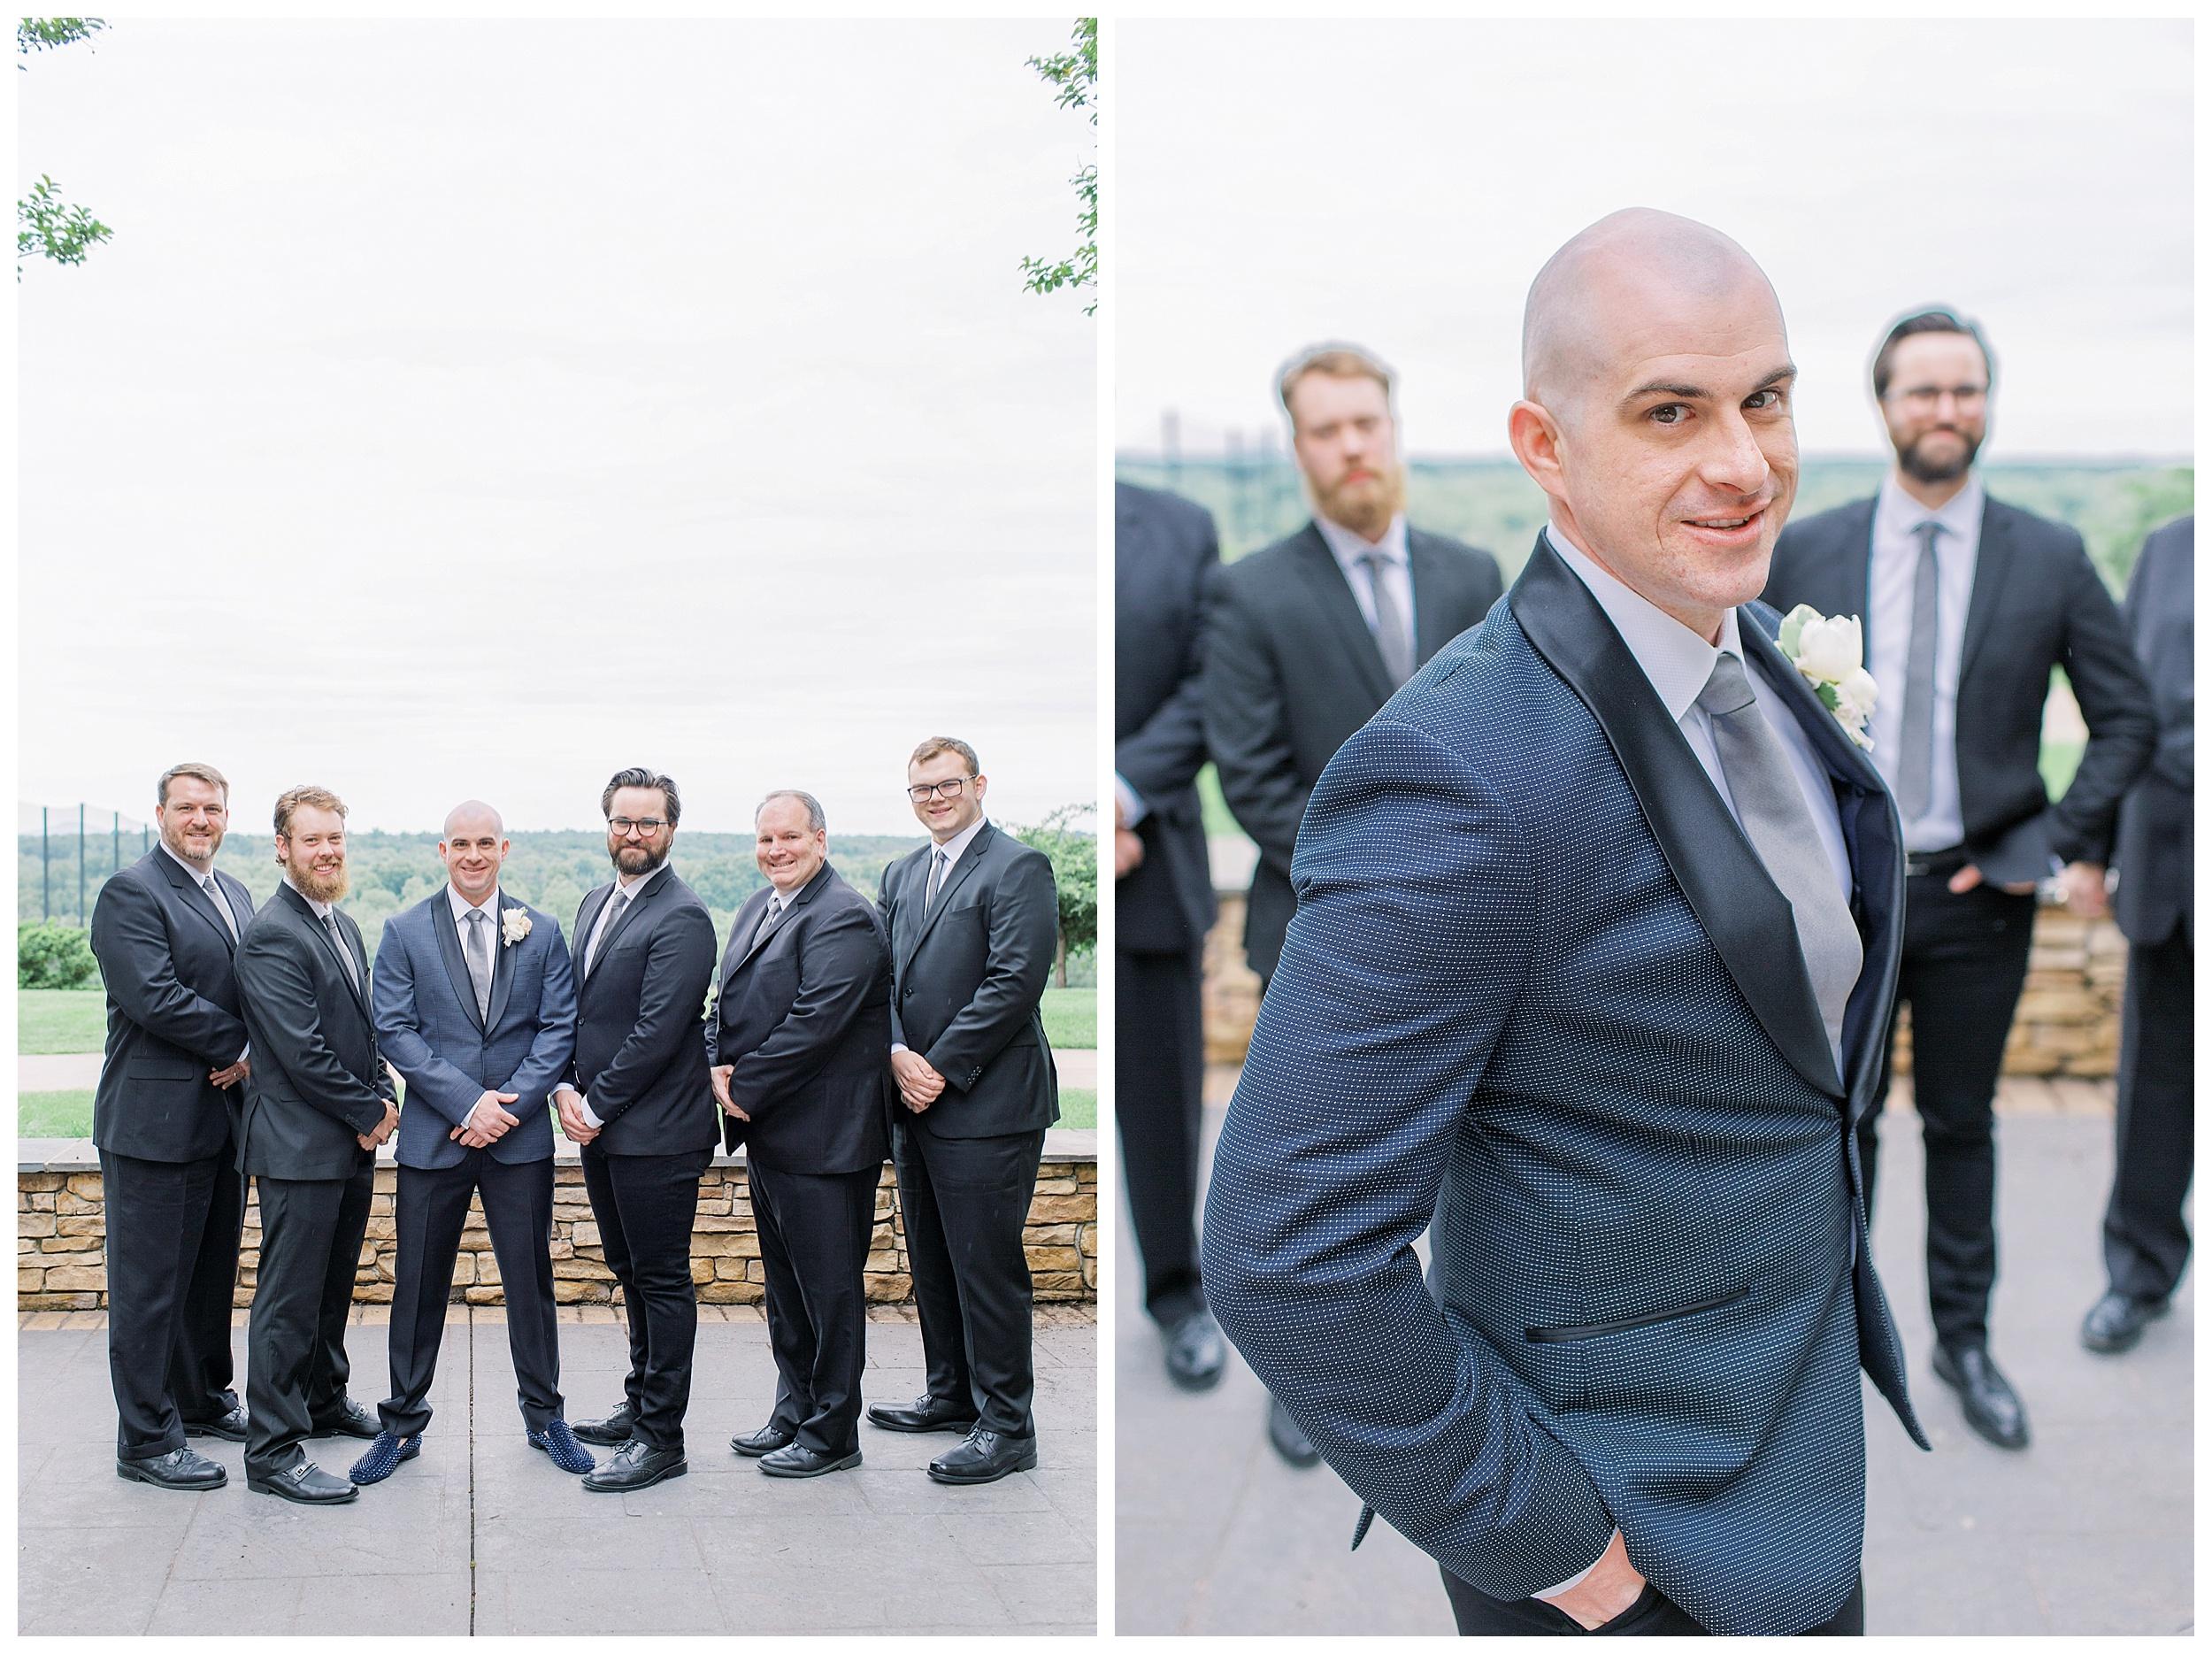 Lansdowne Resort Wedding | Virginia Film Wedding Photographer Kir Tuben_0025.jpg